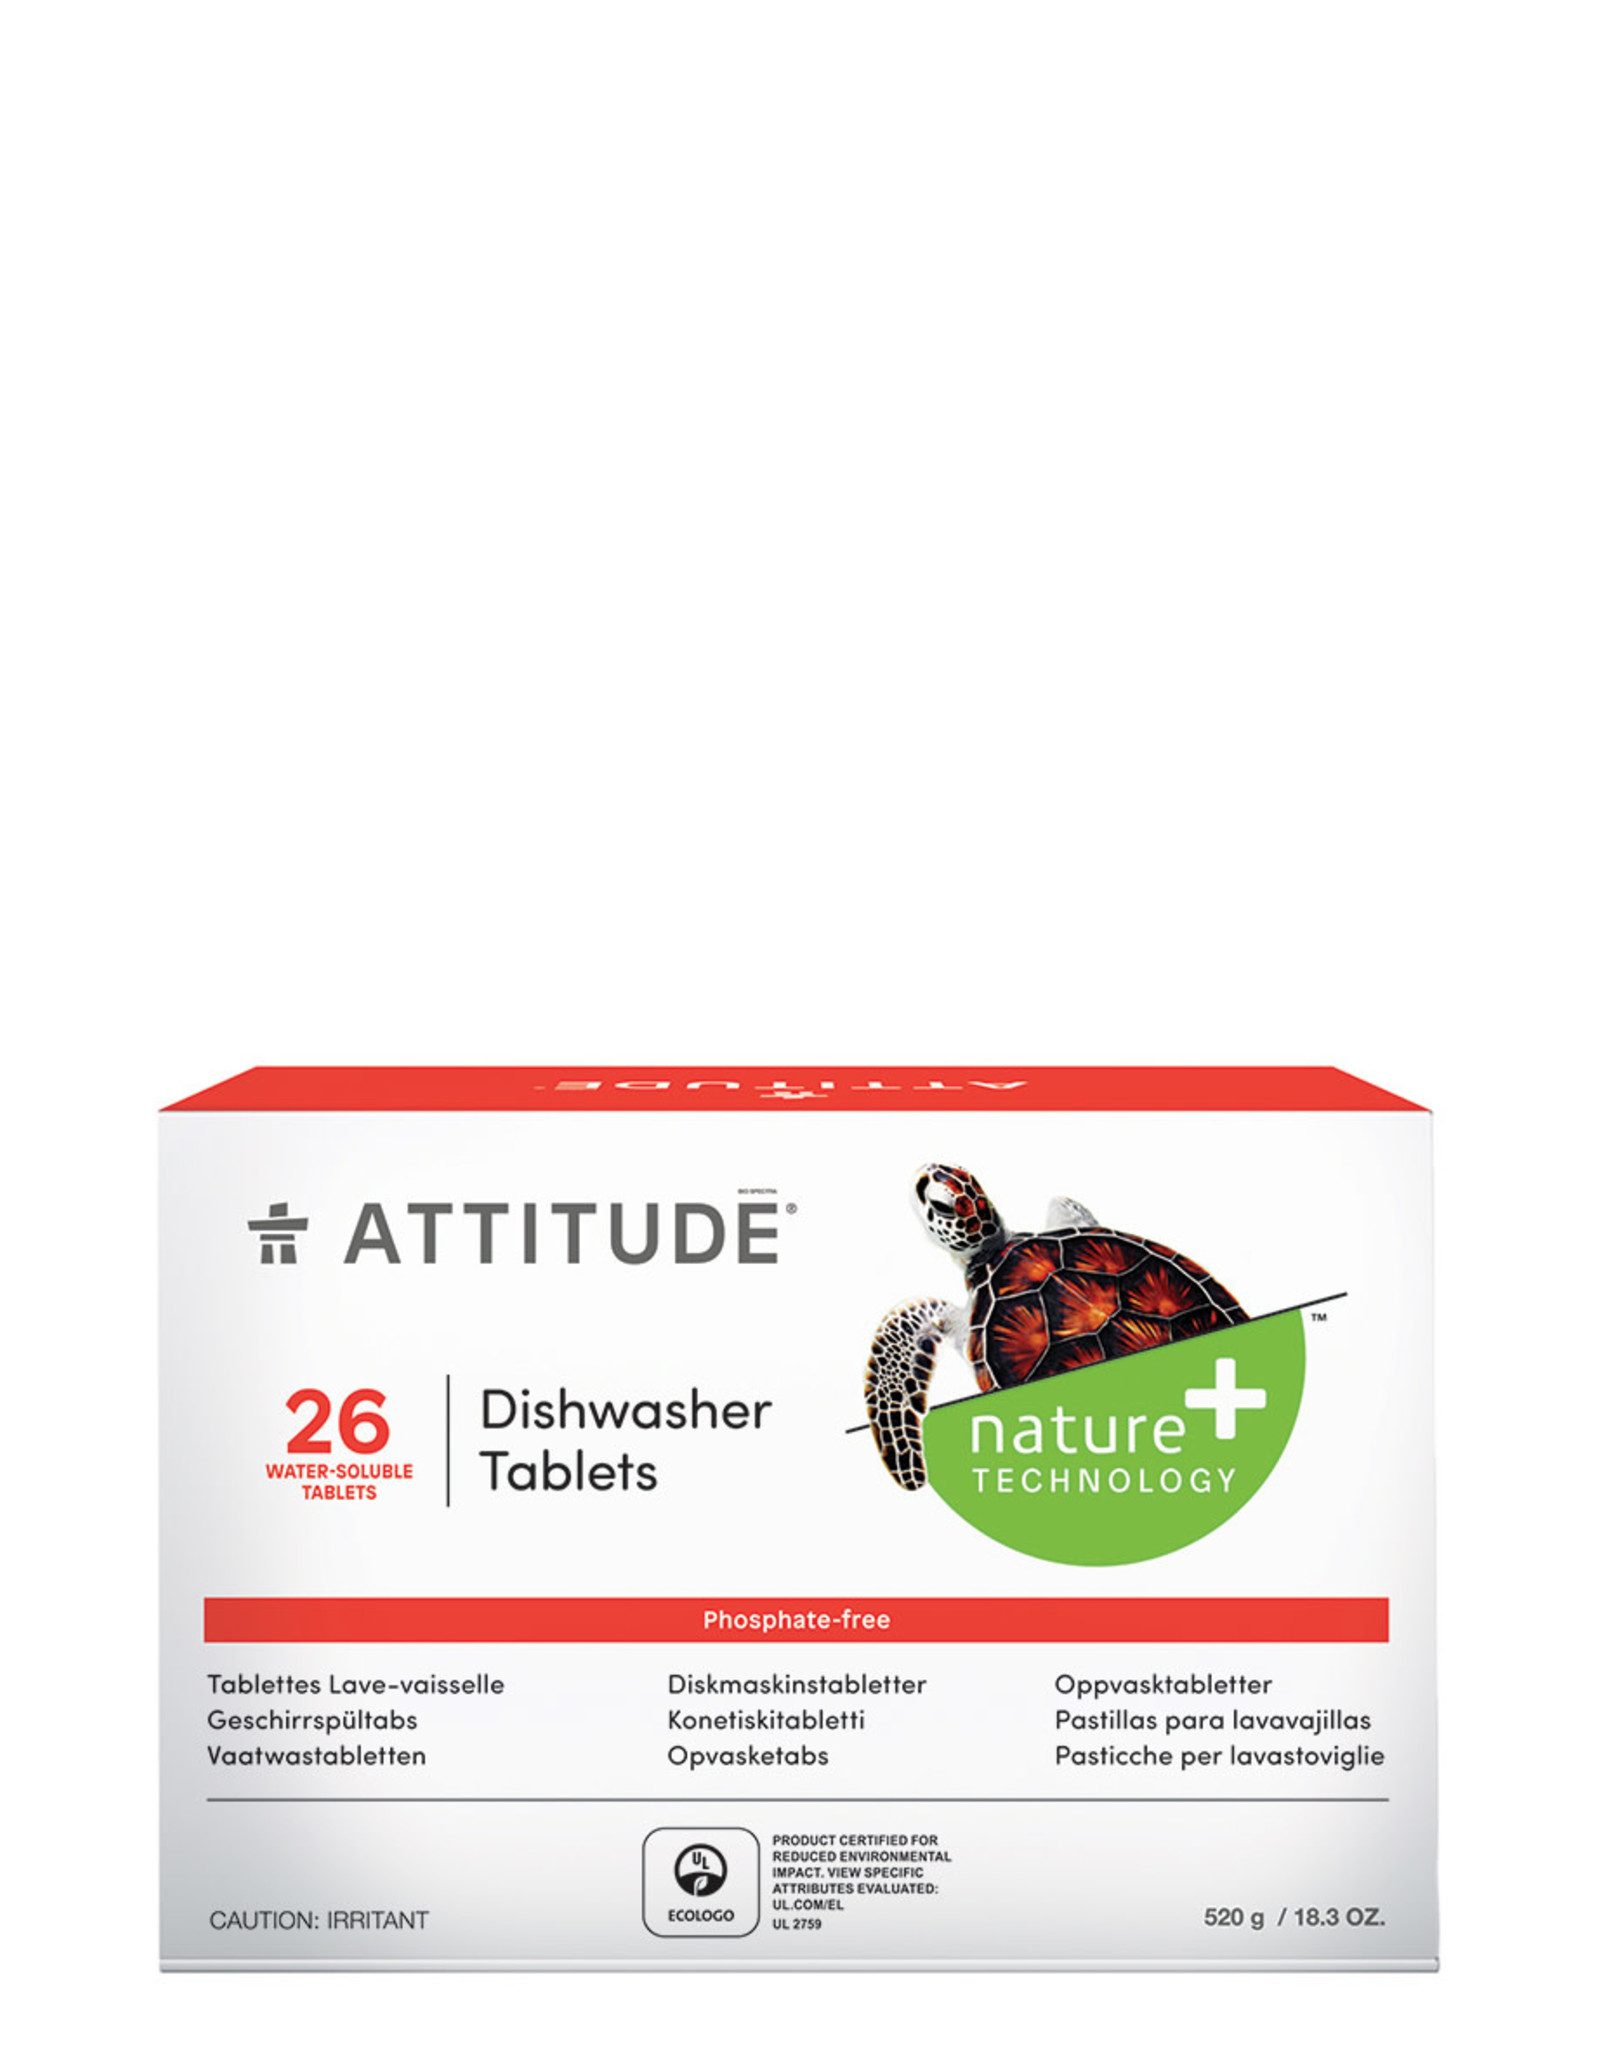 Attitude Attitude Dishwasher Tablets 26 Tablets